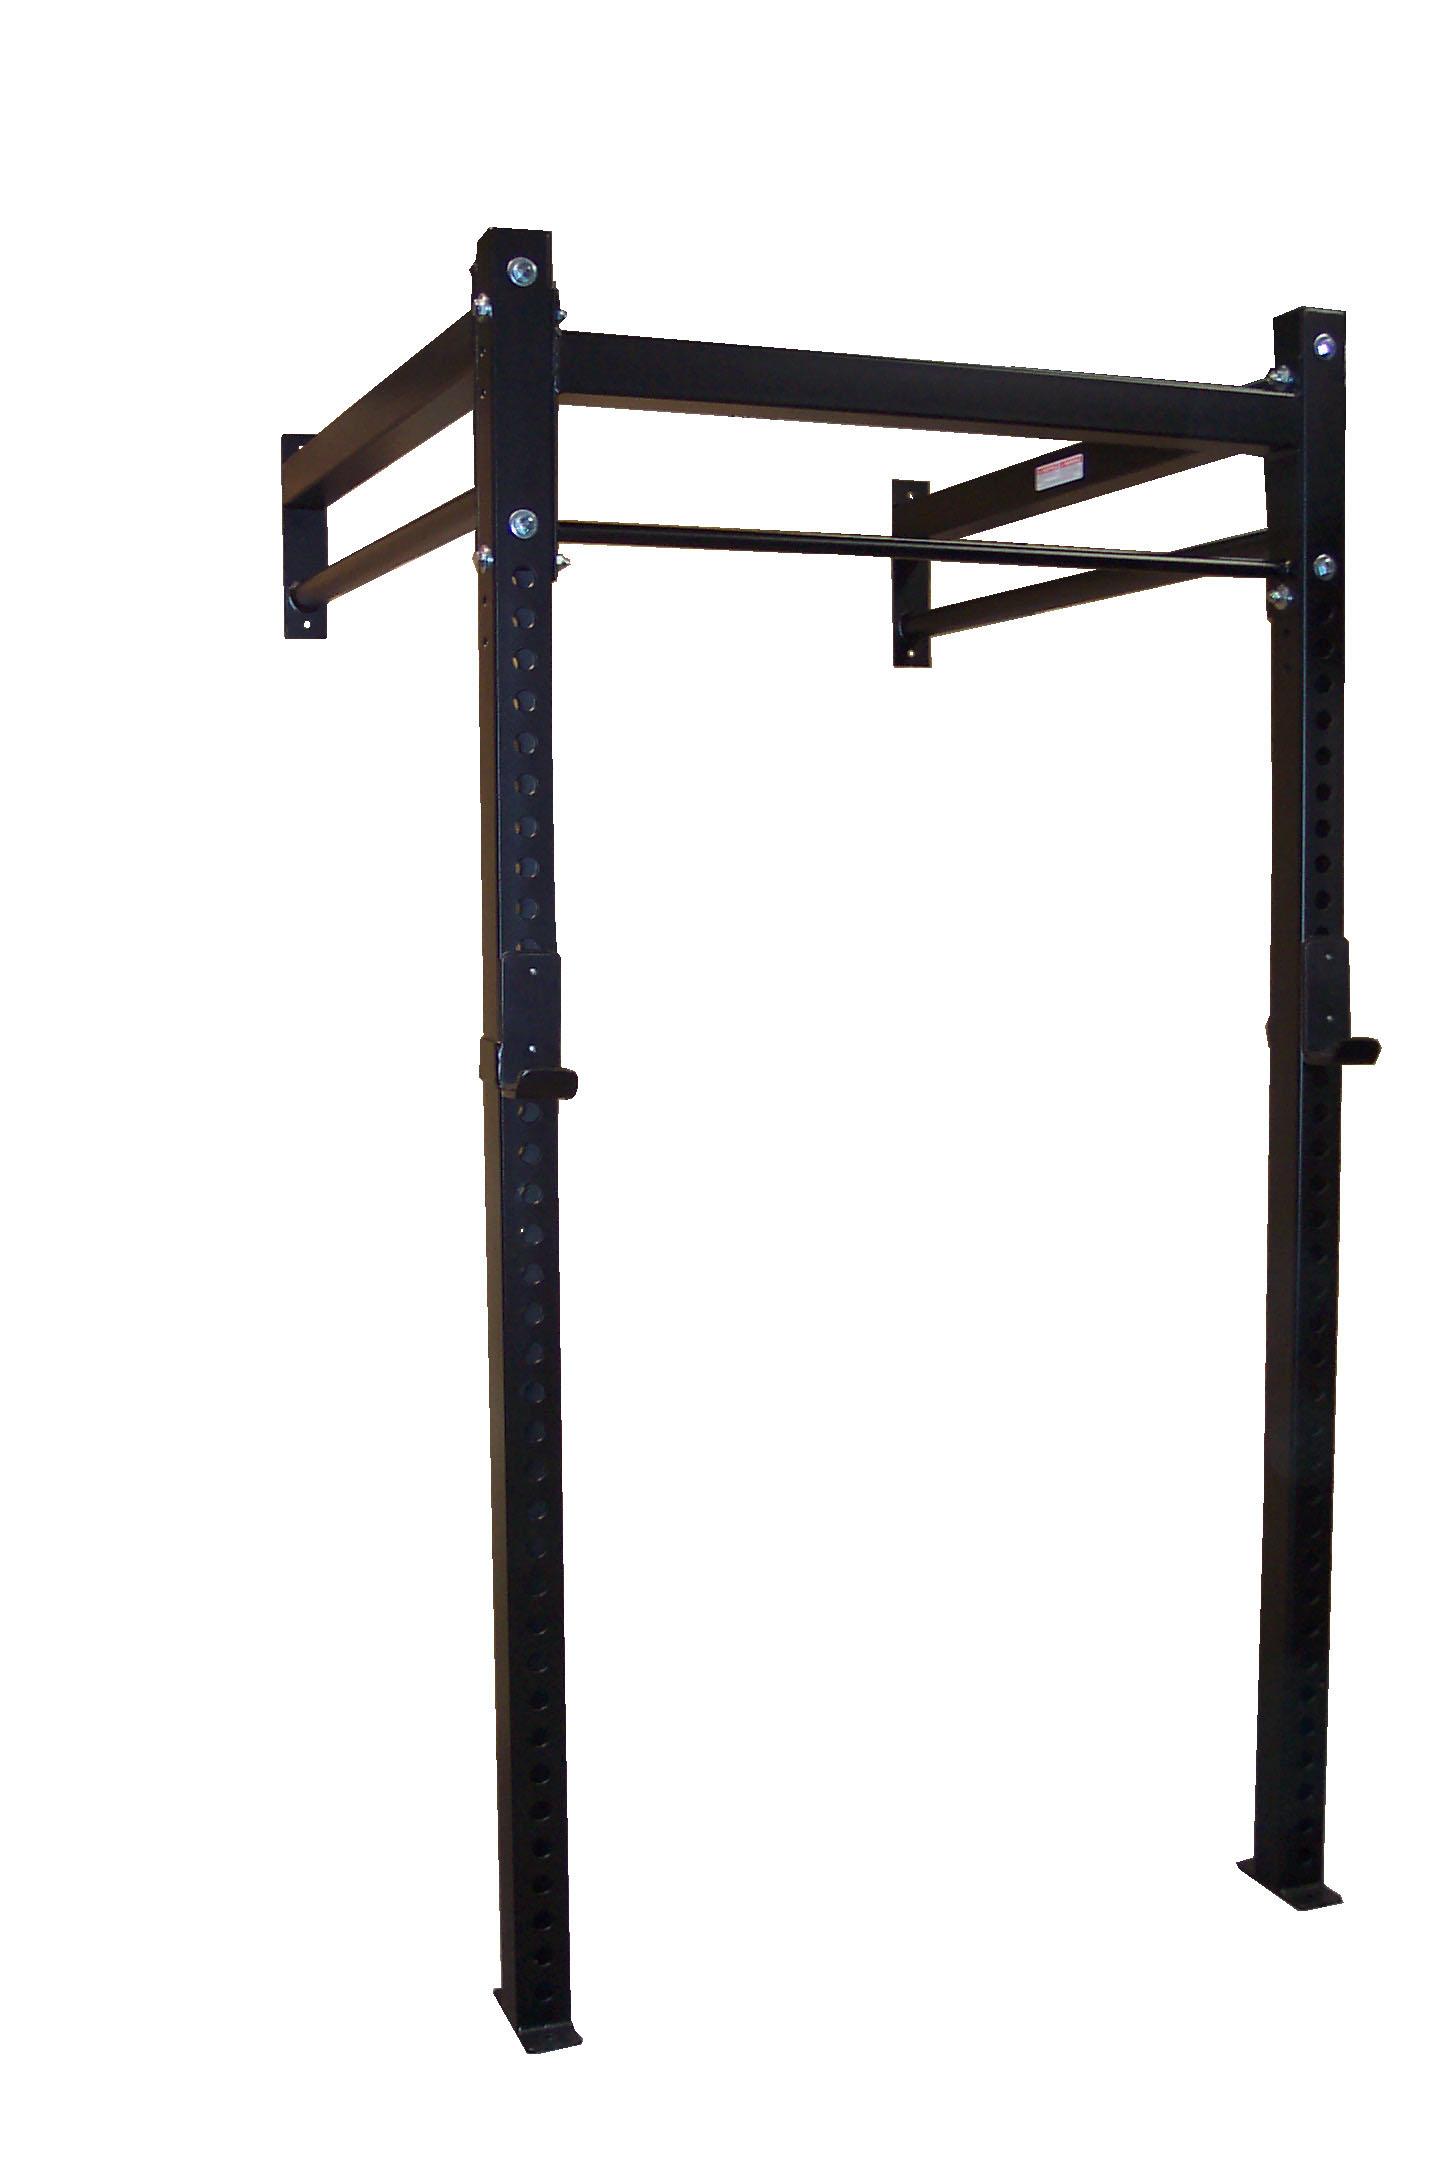 MAX#CHR5 Half Rack (wall mounted)